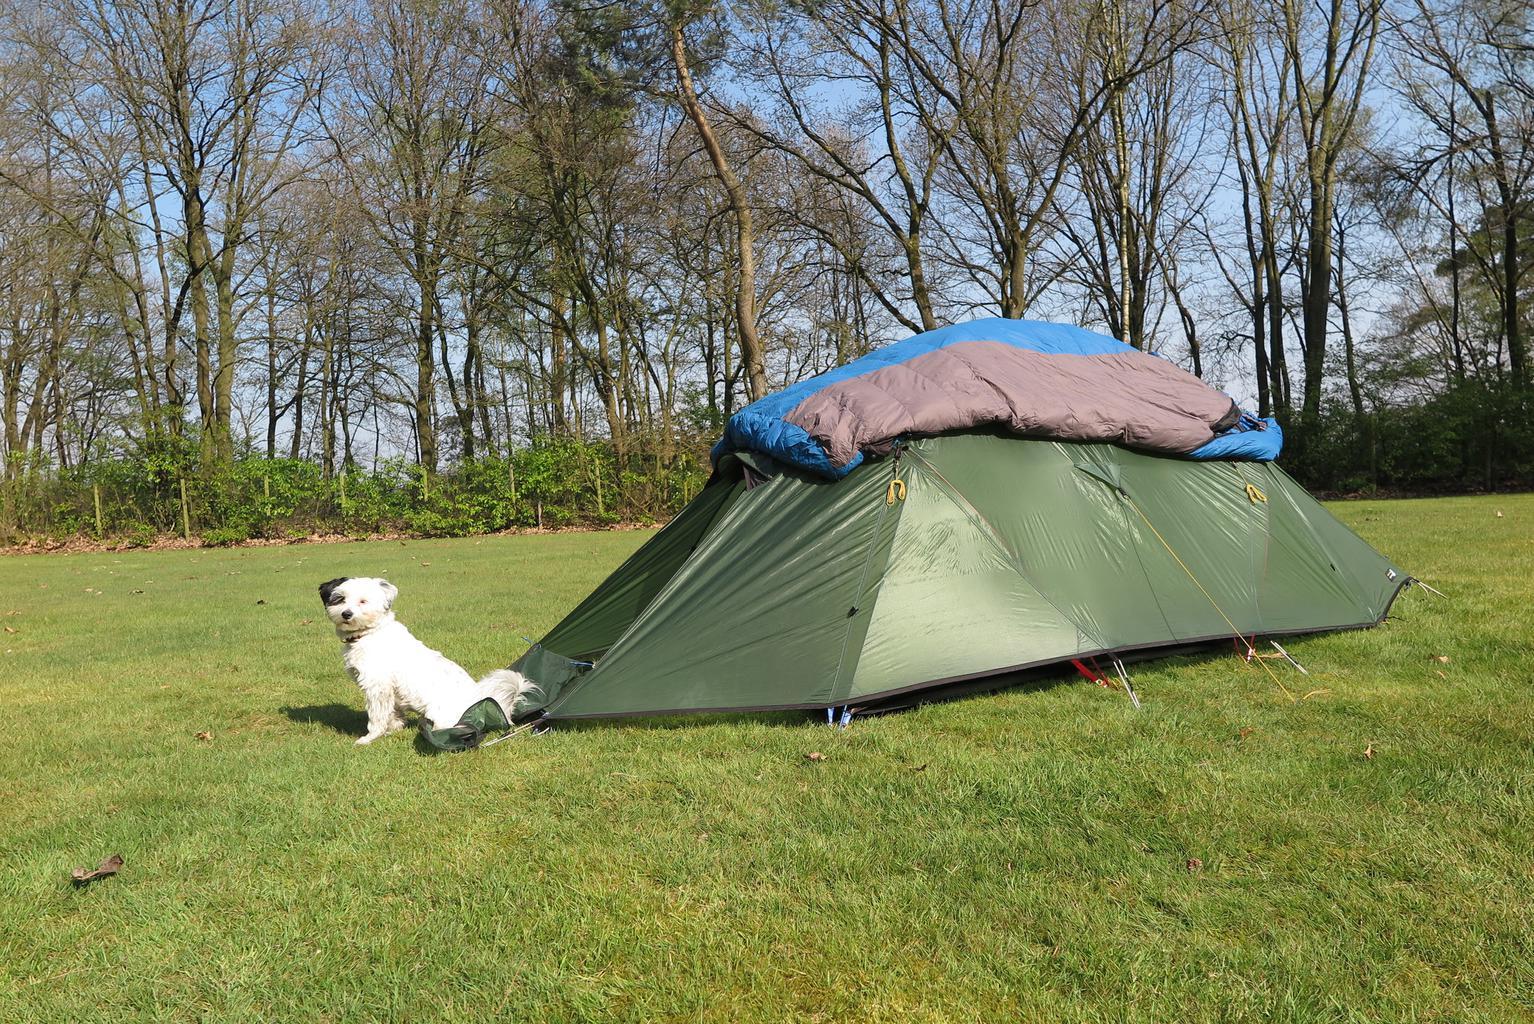 Rocky enjoying a camping trip. Tags: camping dog tent